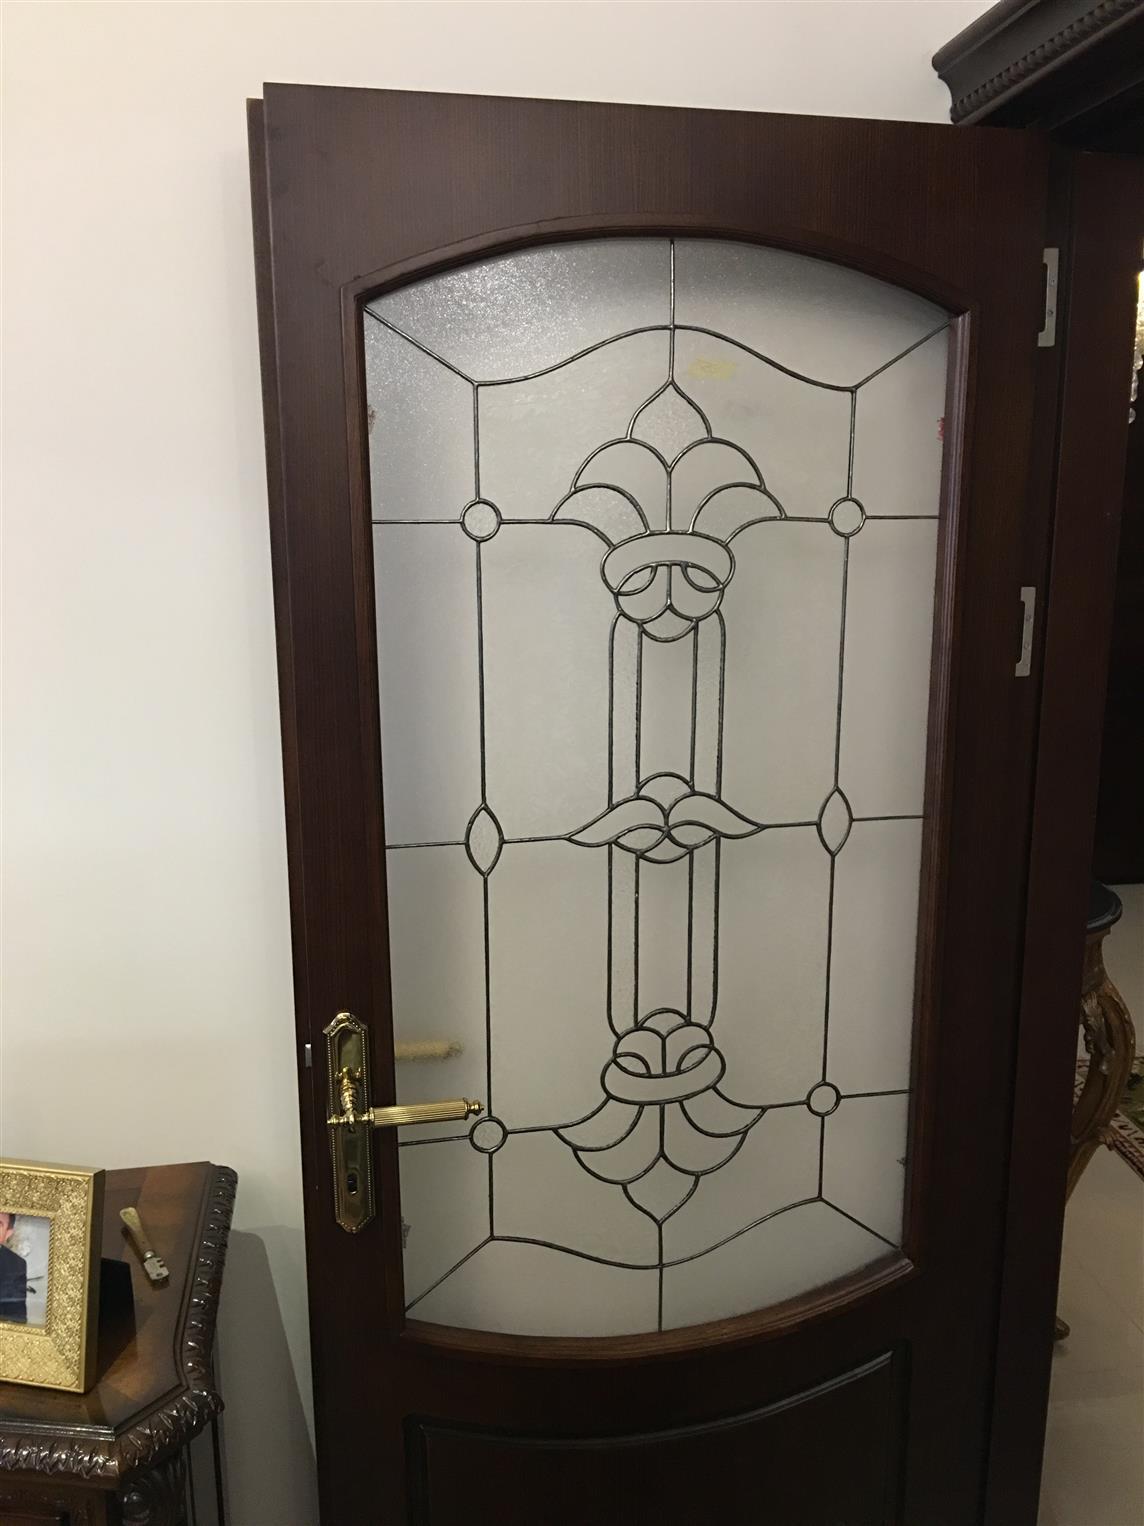 kapi-vitray-karsiyaka-girne2016521445649.jpg izmir vitray çalışması